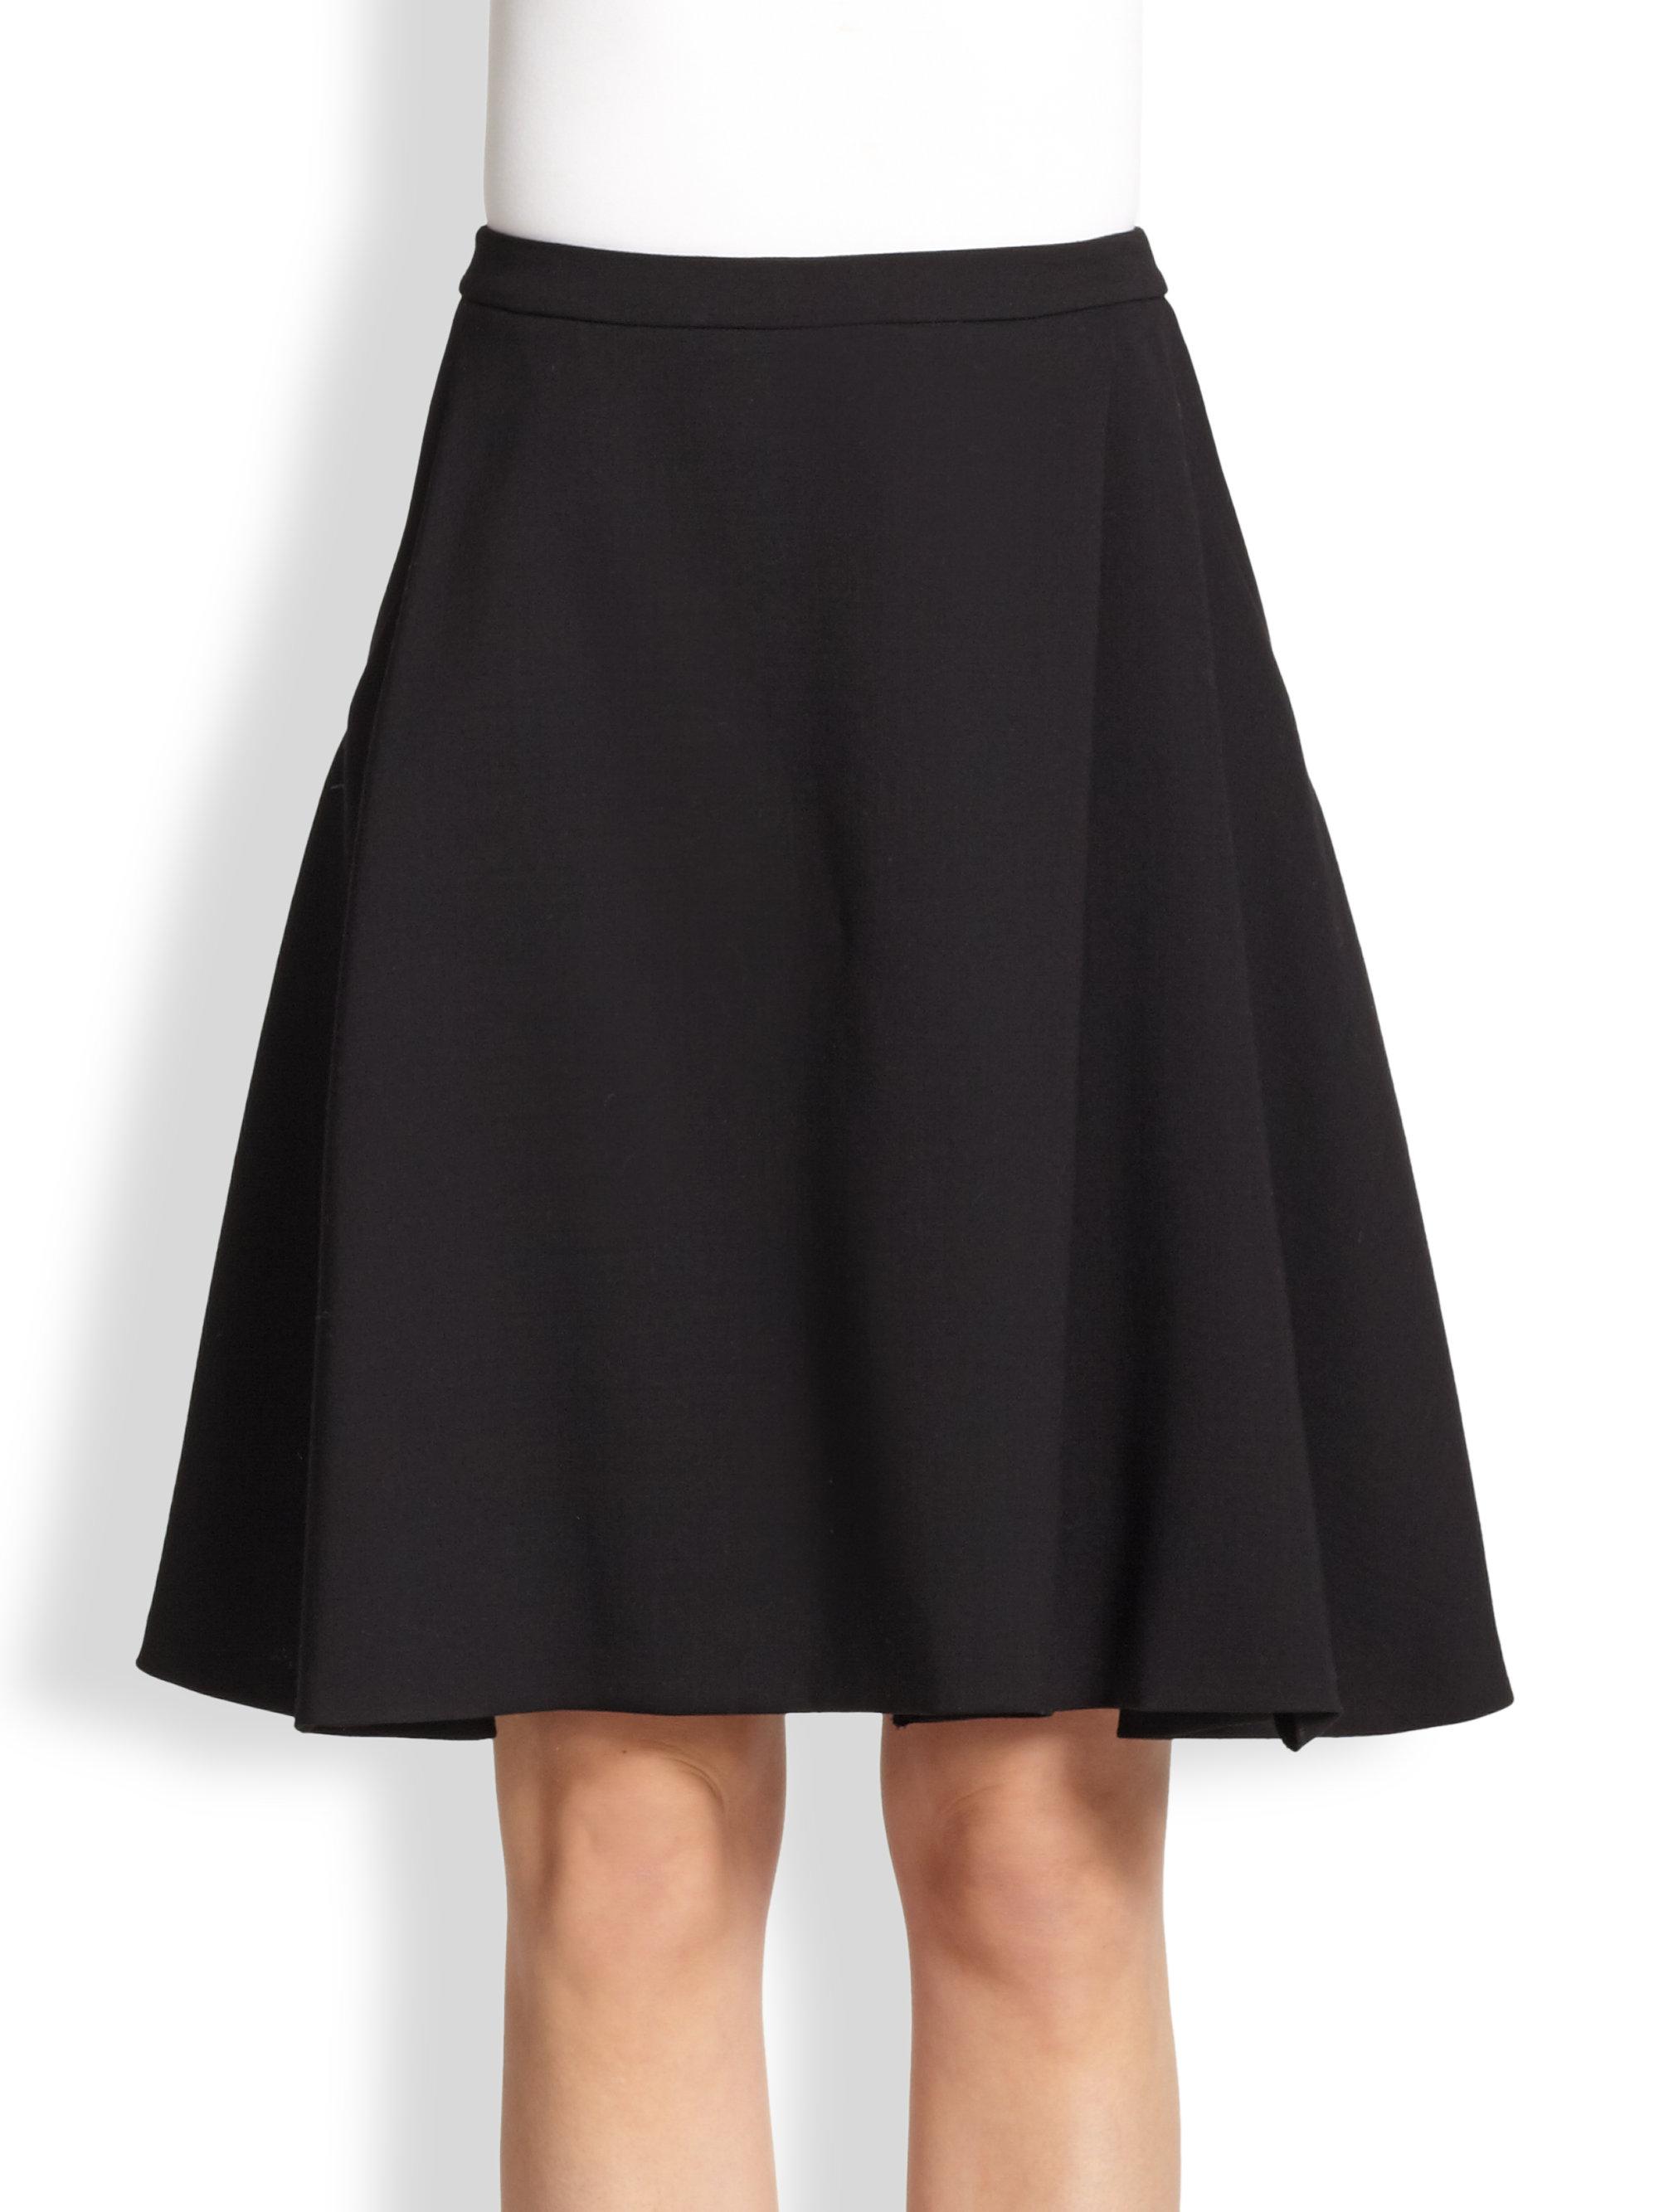 Max mara Wool A-Line Skirt in Black | Lyst